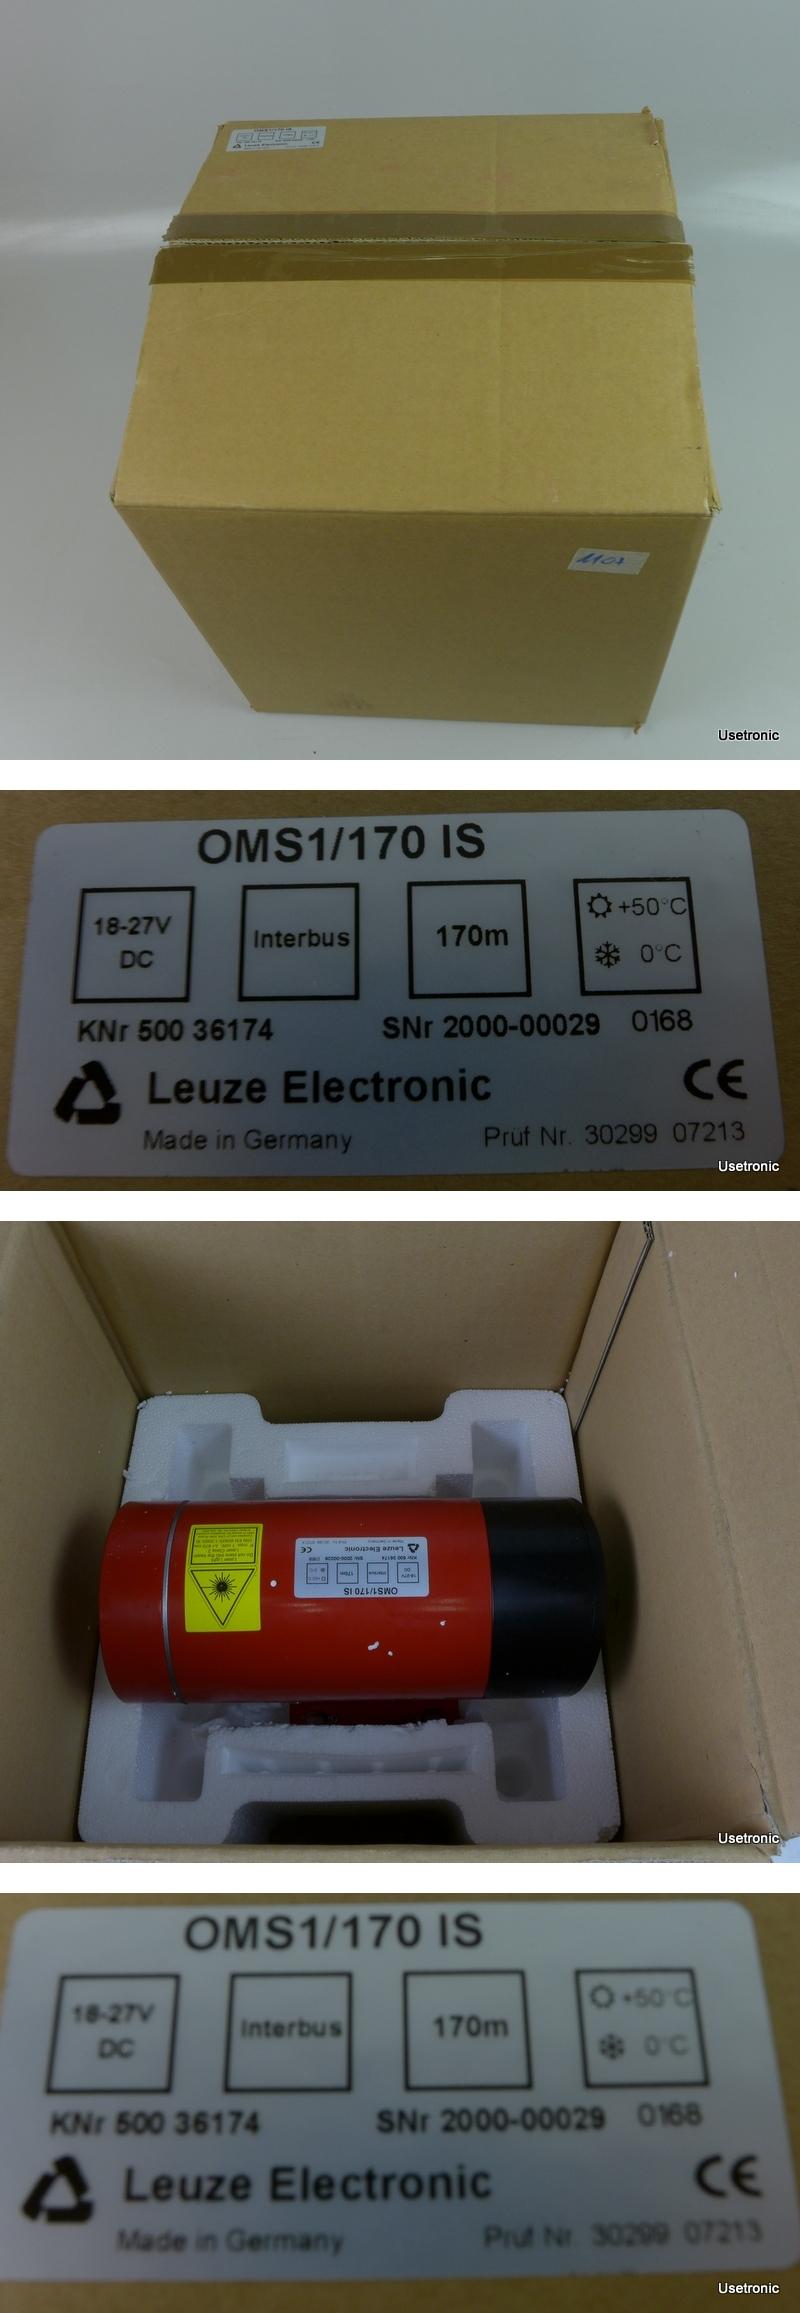 Leuze OMS1/170 IS